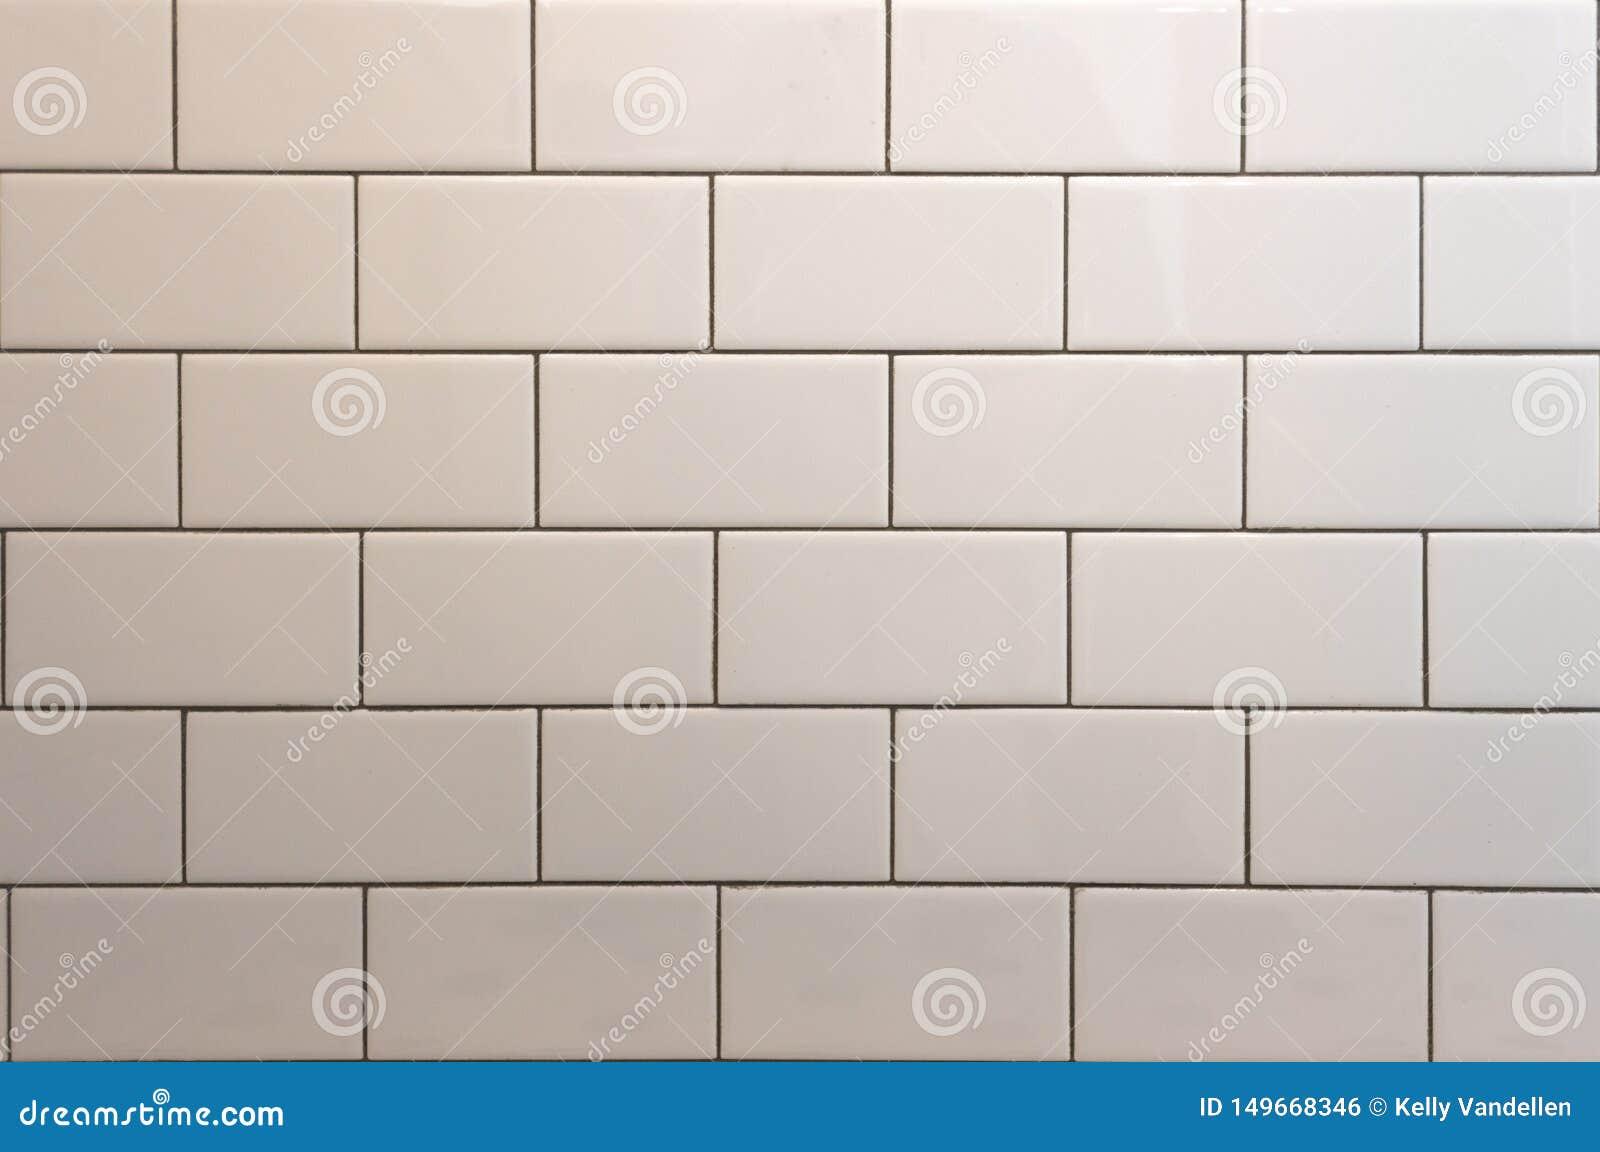 Vector Clipart - Stone tile seamless background. Vector Illustration  gg60409065 - GoGraph